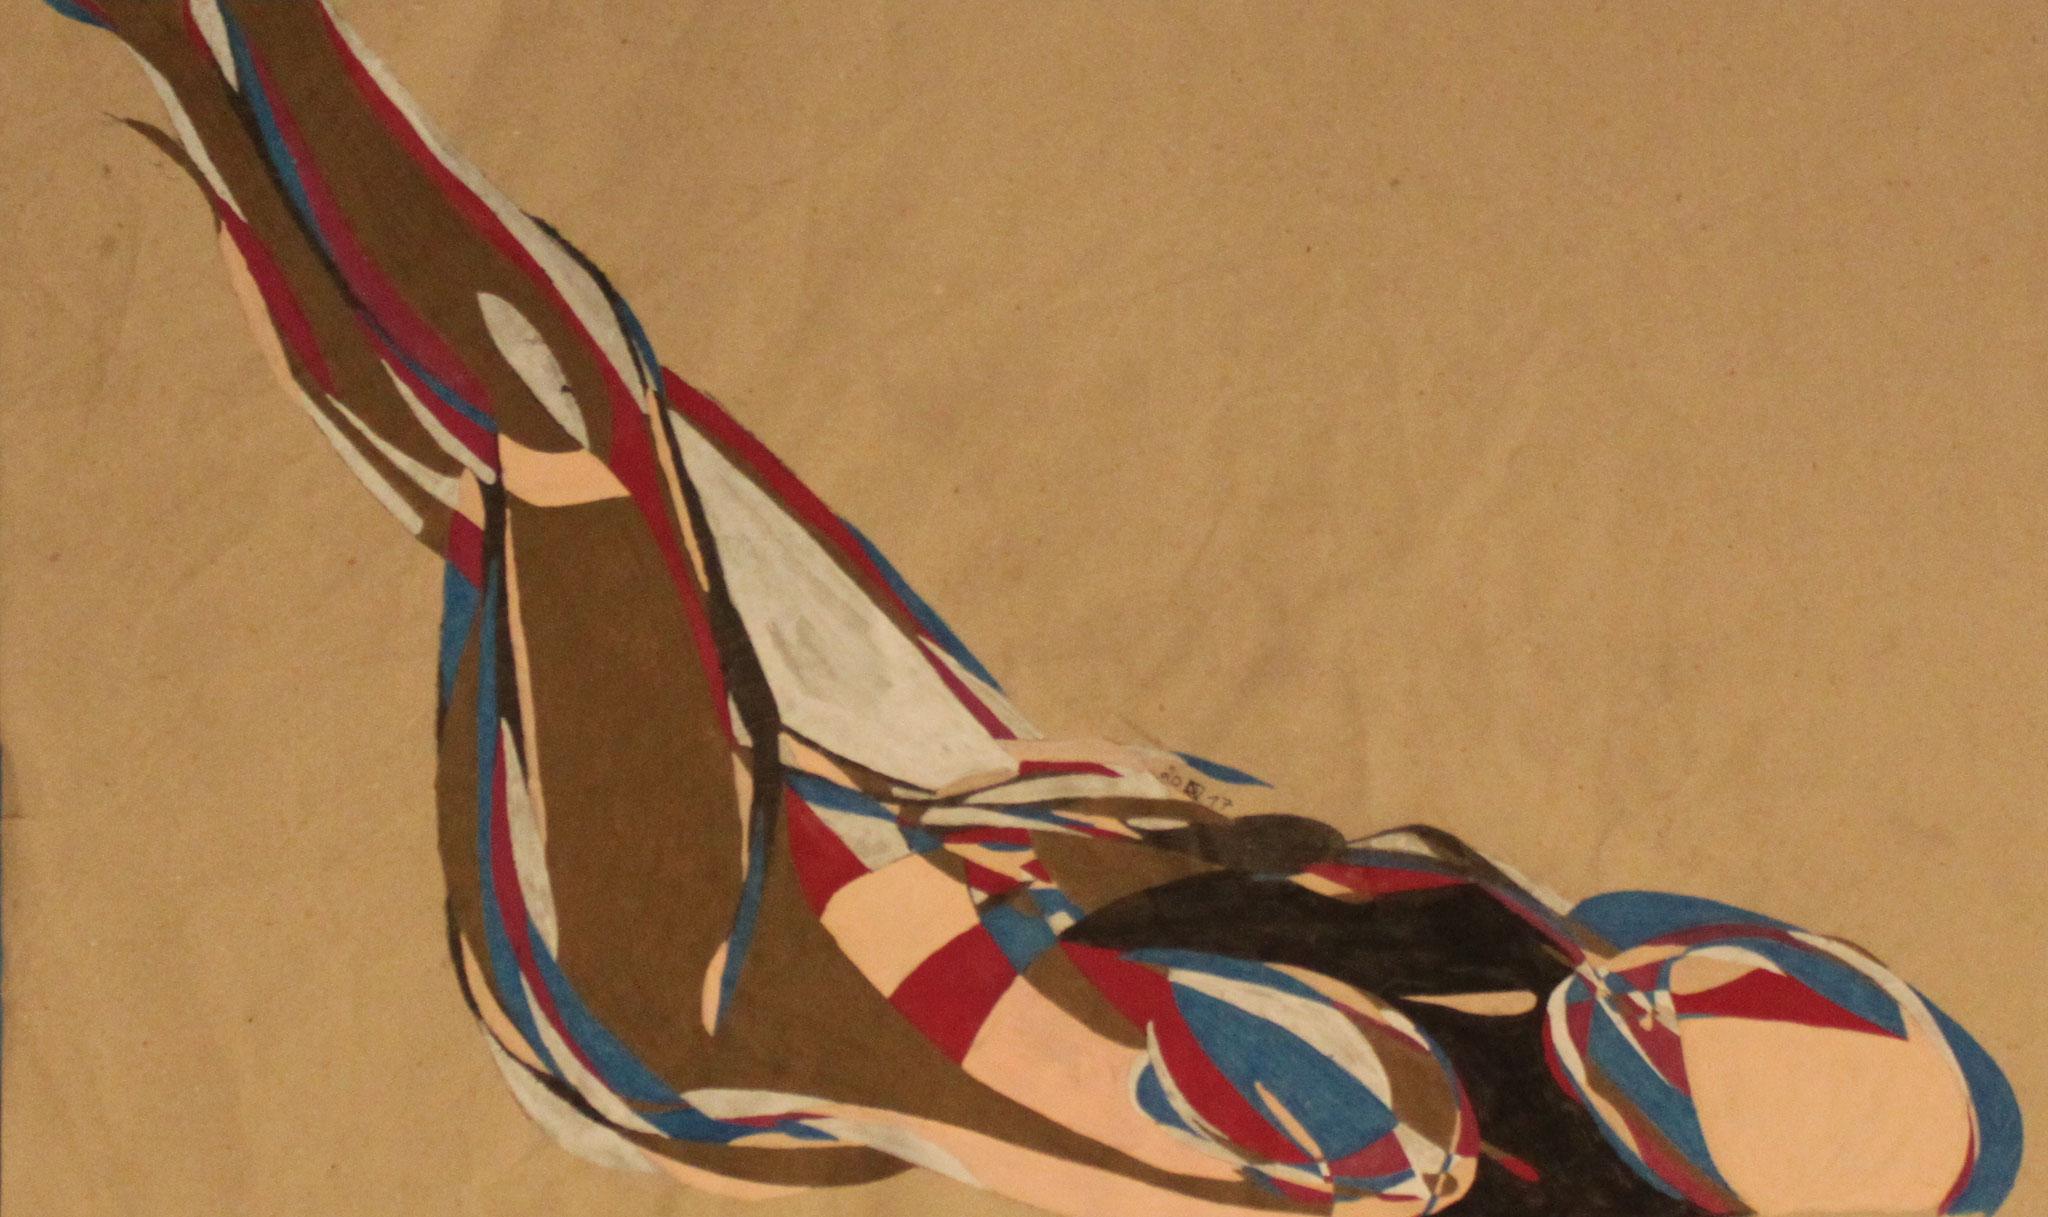 Lying, Aquarell und Buntstift auf Papier, 2017,  42 cm x 70 cm